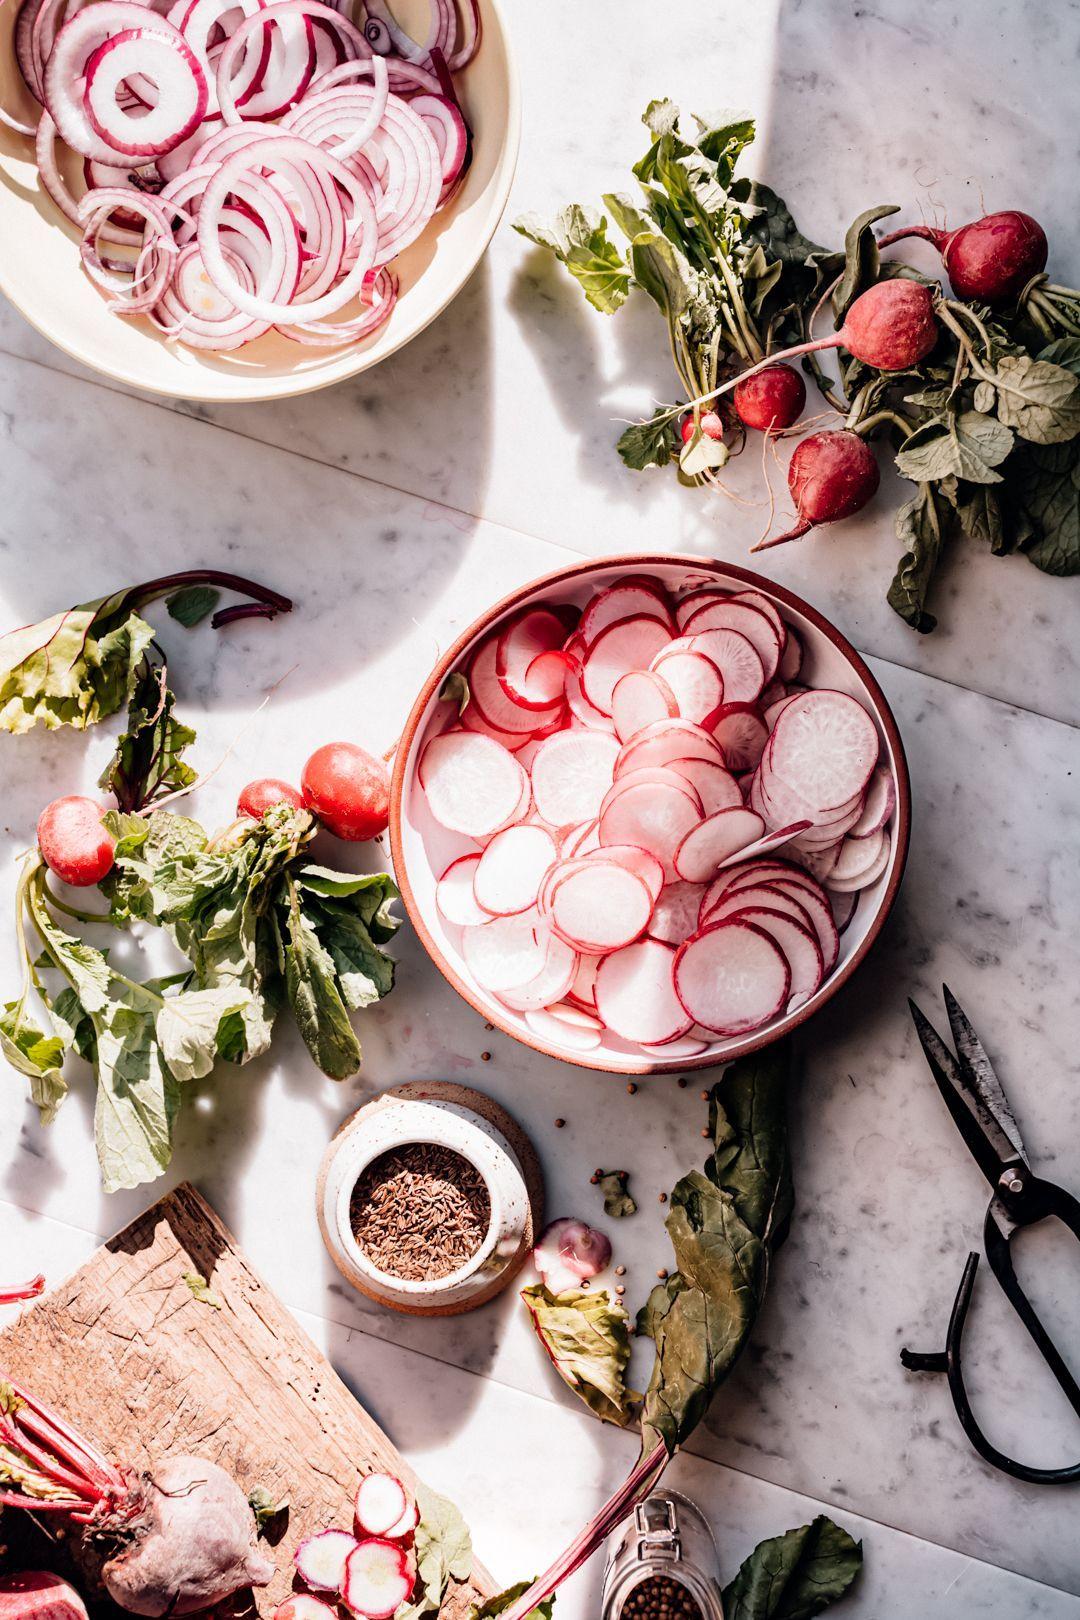 Quick Pickled Veggies - Christiann Koepke #food #foodphotography #foodstyling #healthyfood #healthyrecipes #pickledveggies #fermentedrecipes #veggies #vegetables #vegetarian #vegan